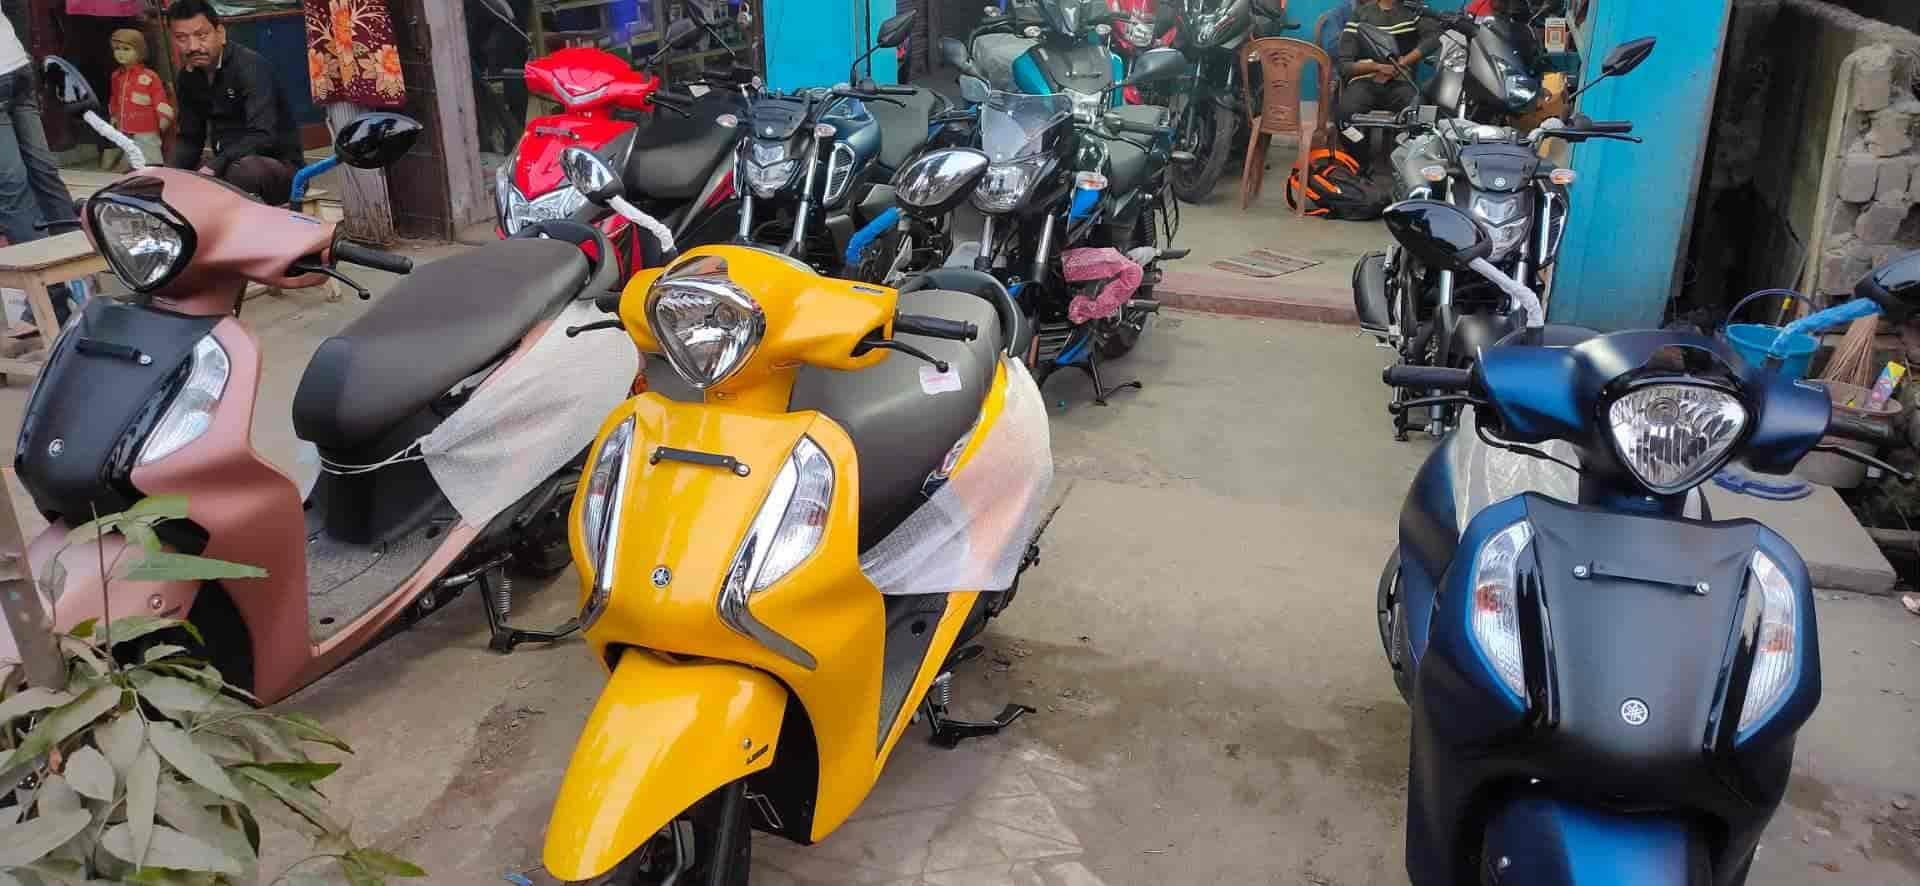 Top Hyosung Motorcycle Dealers In Kolkata Best Hyosung